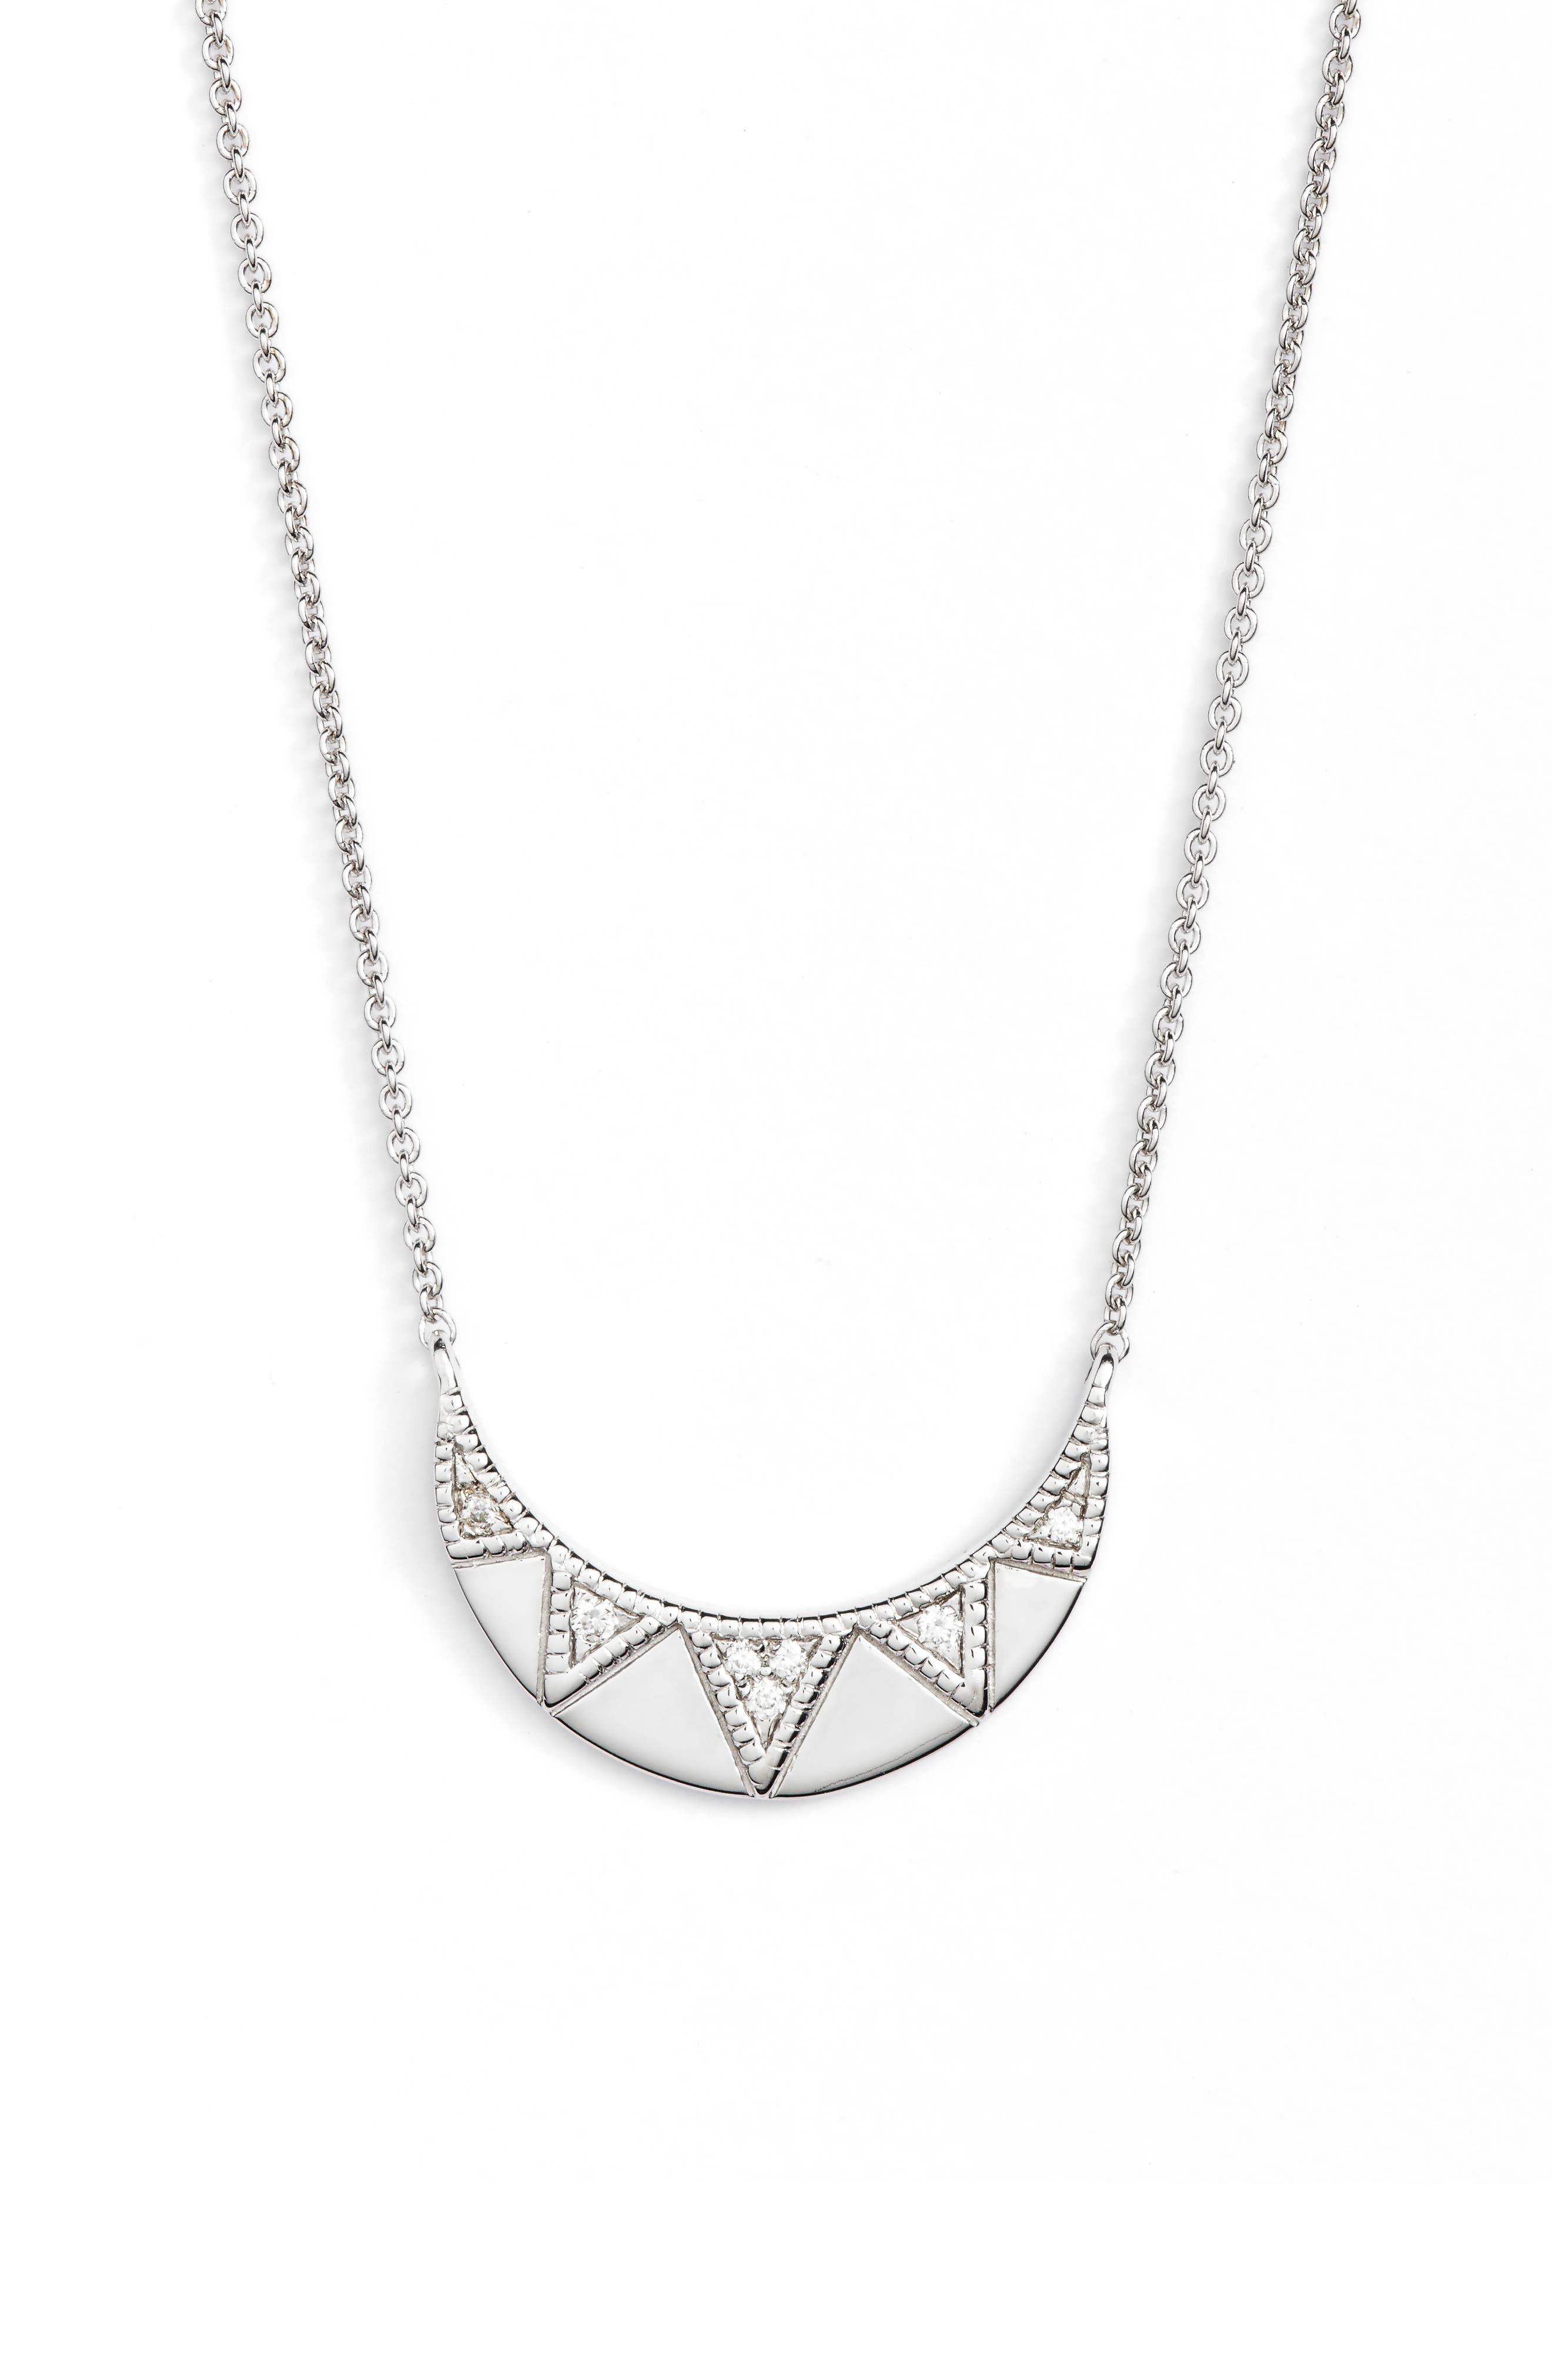 Jeanie Ann Diamond Pendant Necklace,                         Main,                         color, White Gold